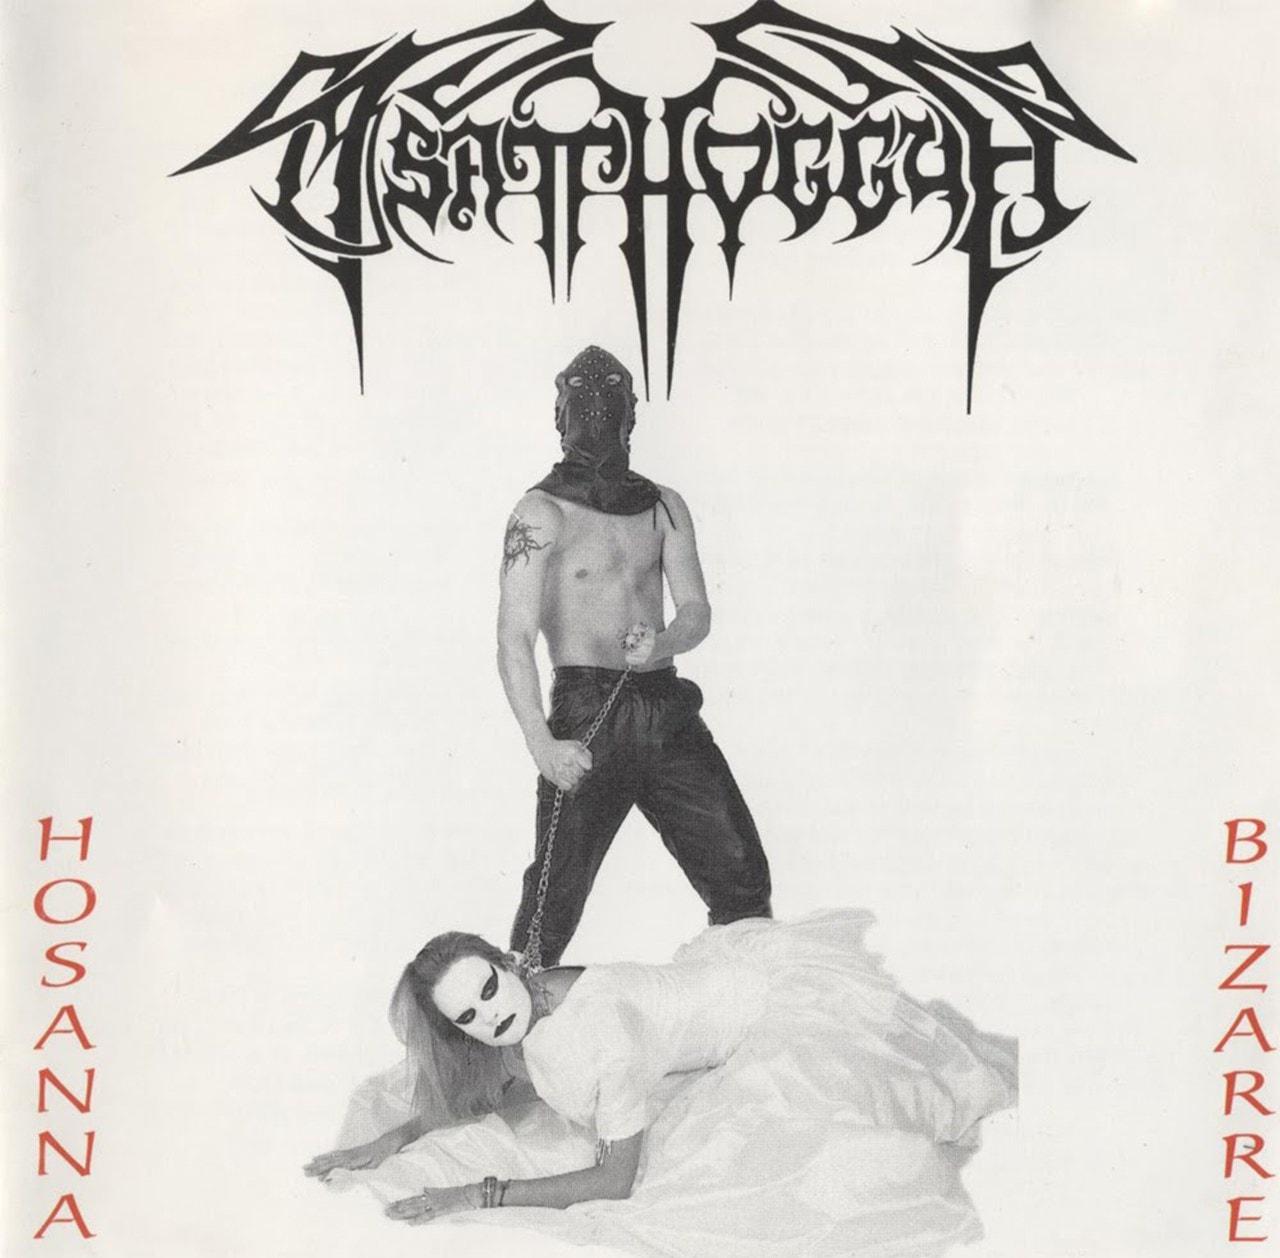 Hosanna Bizarre - 1